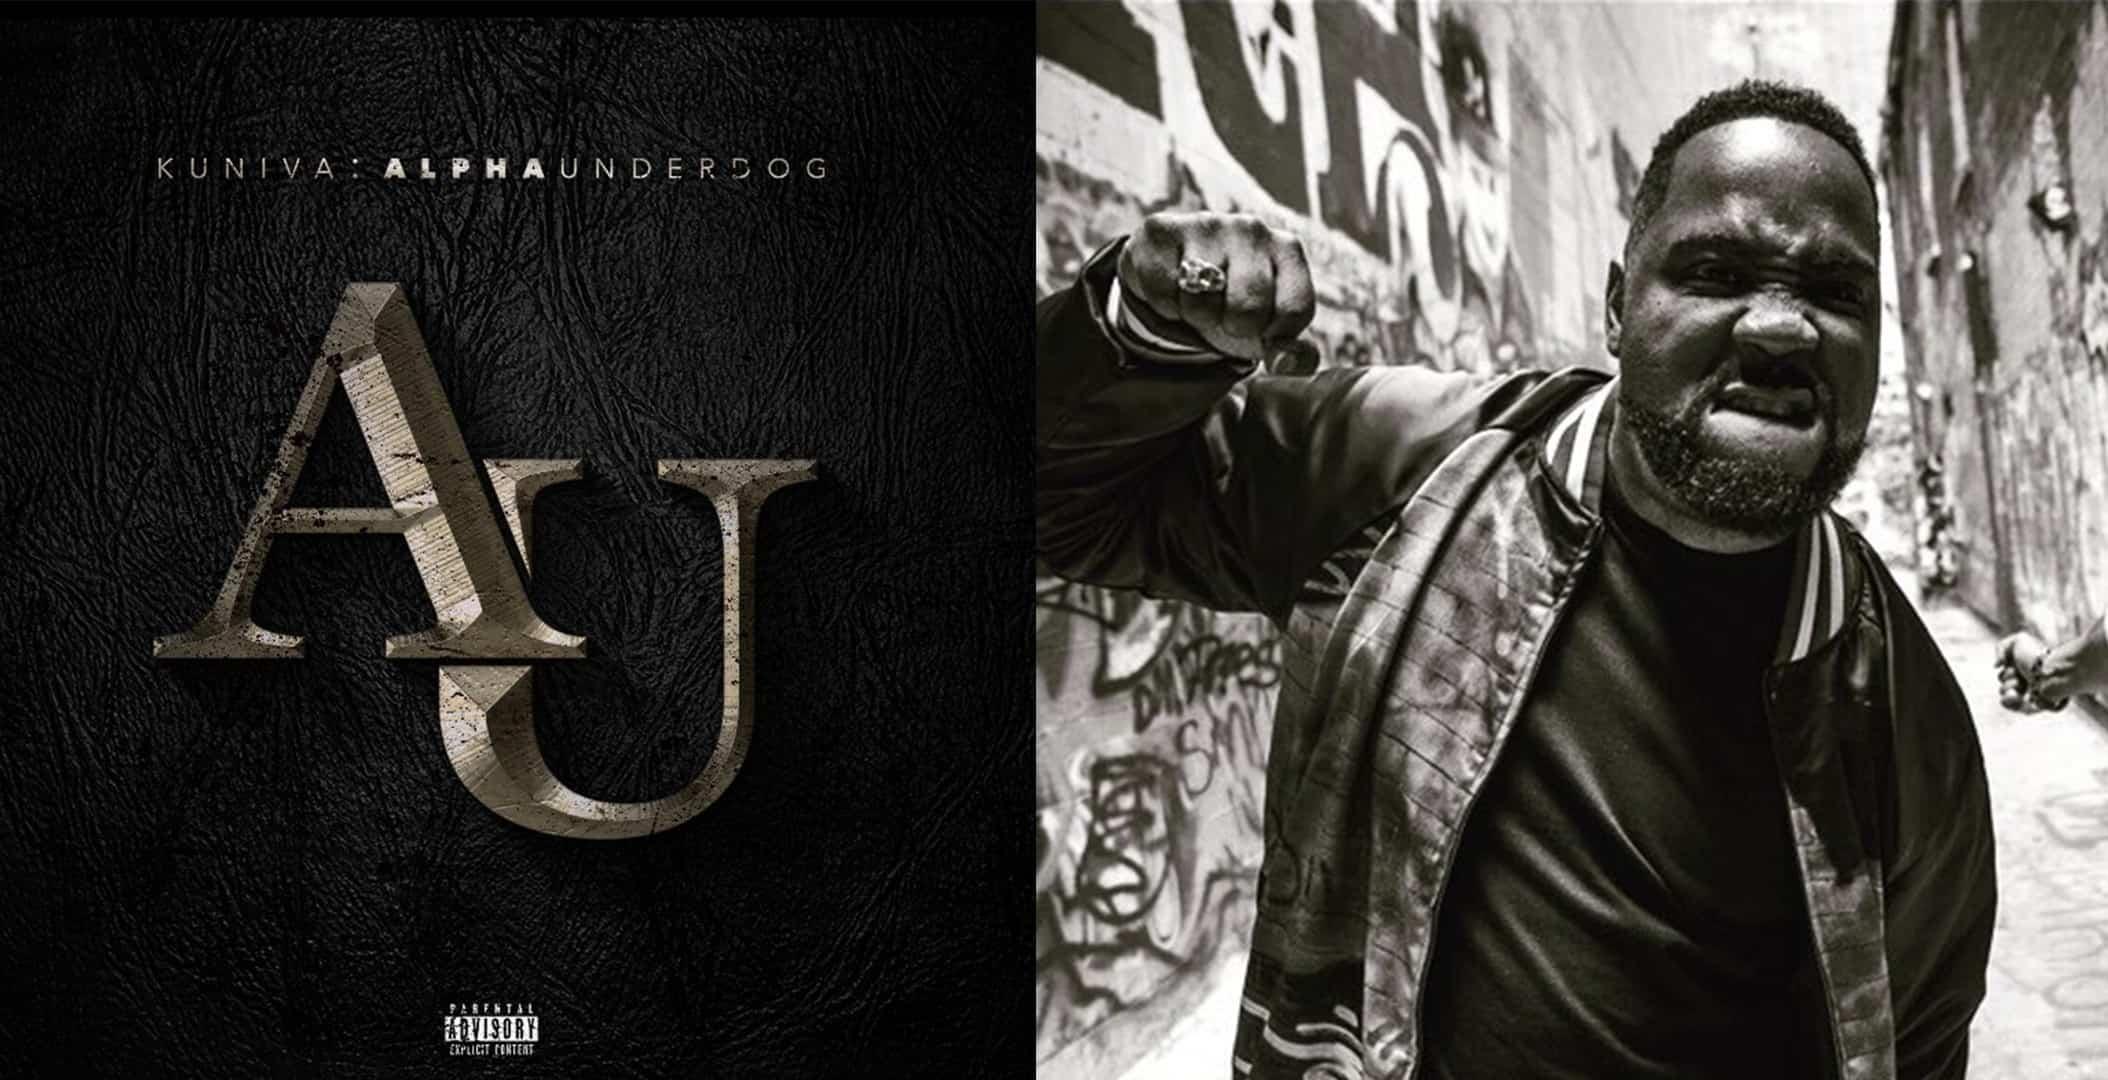 kuniva-alpha-underdog-new-album